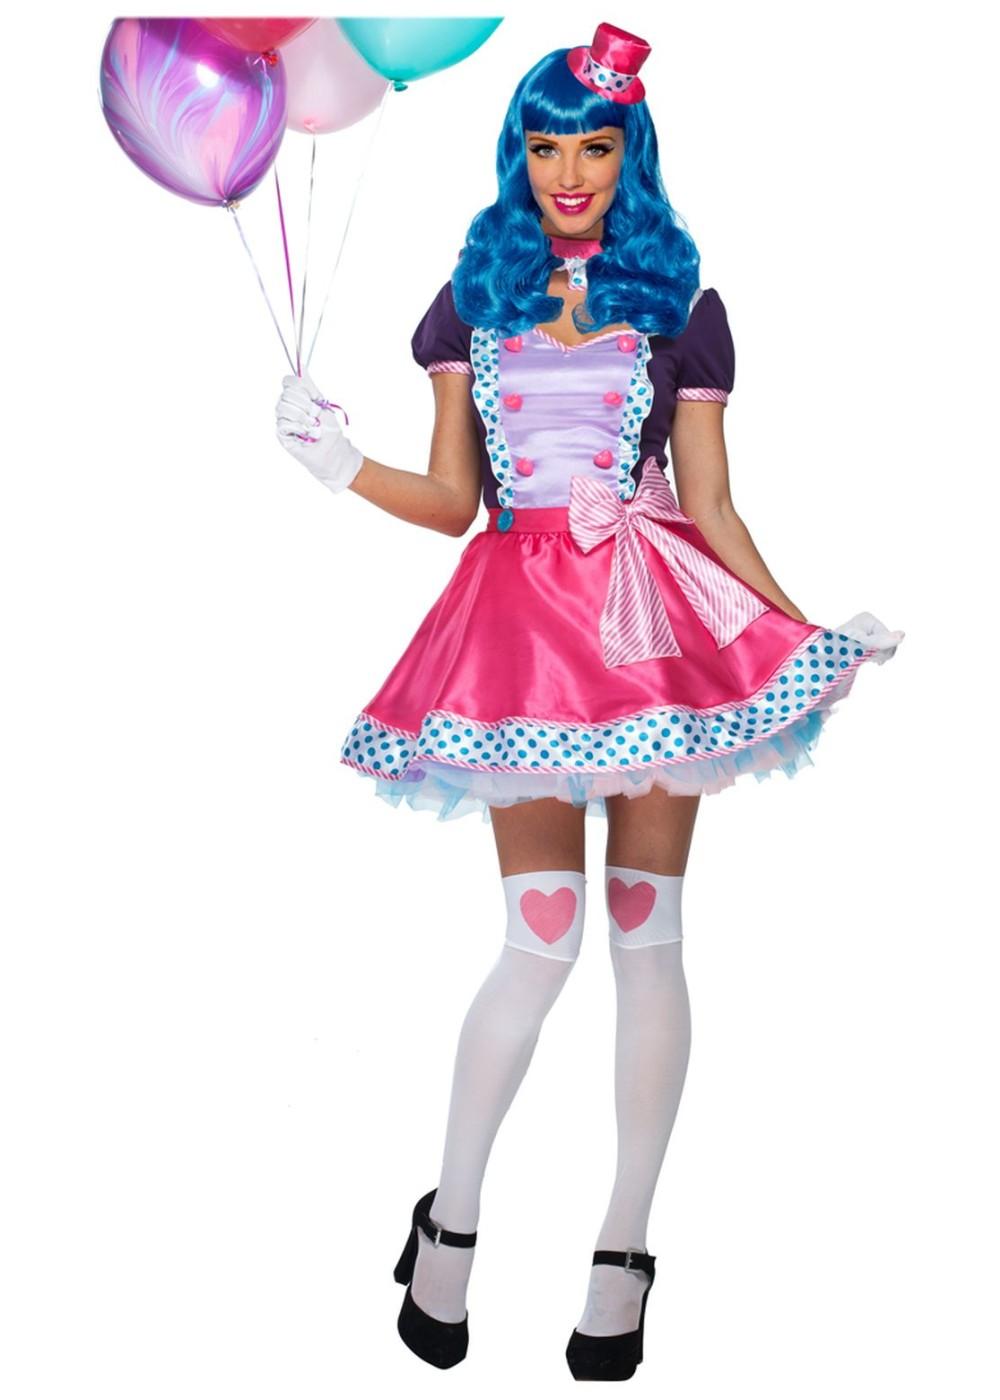 Candy Clown Bubble Gum Women Costume Clown Costumes